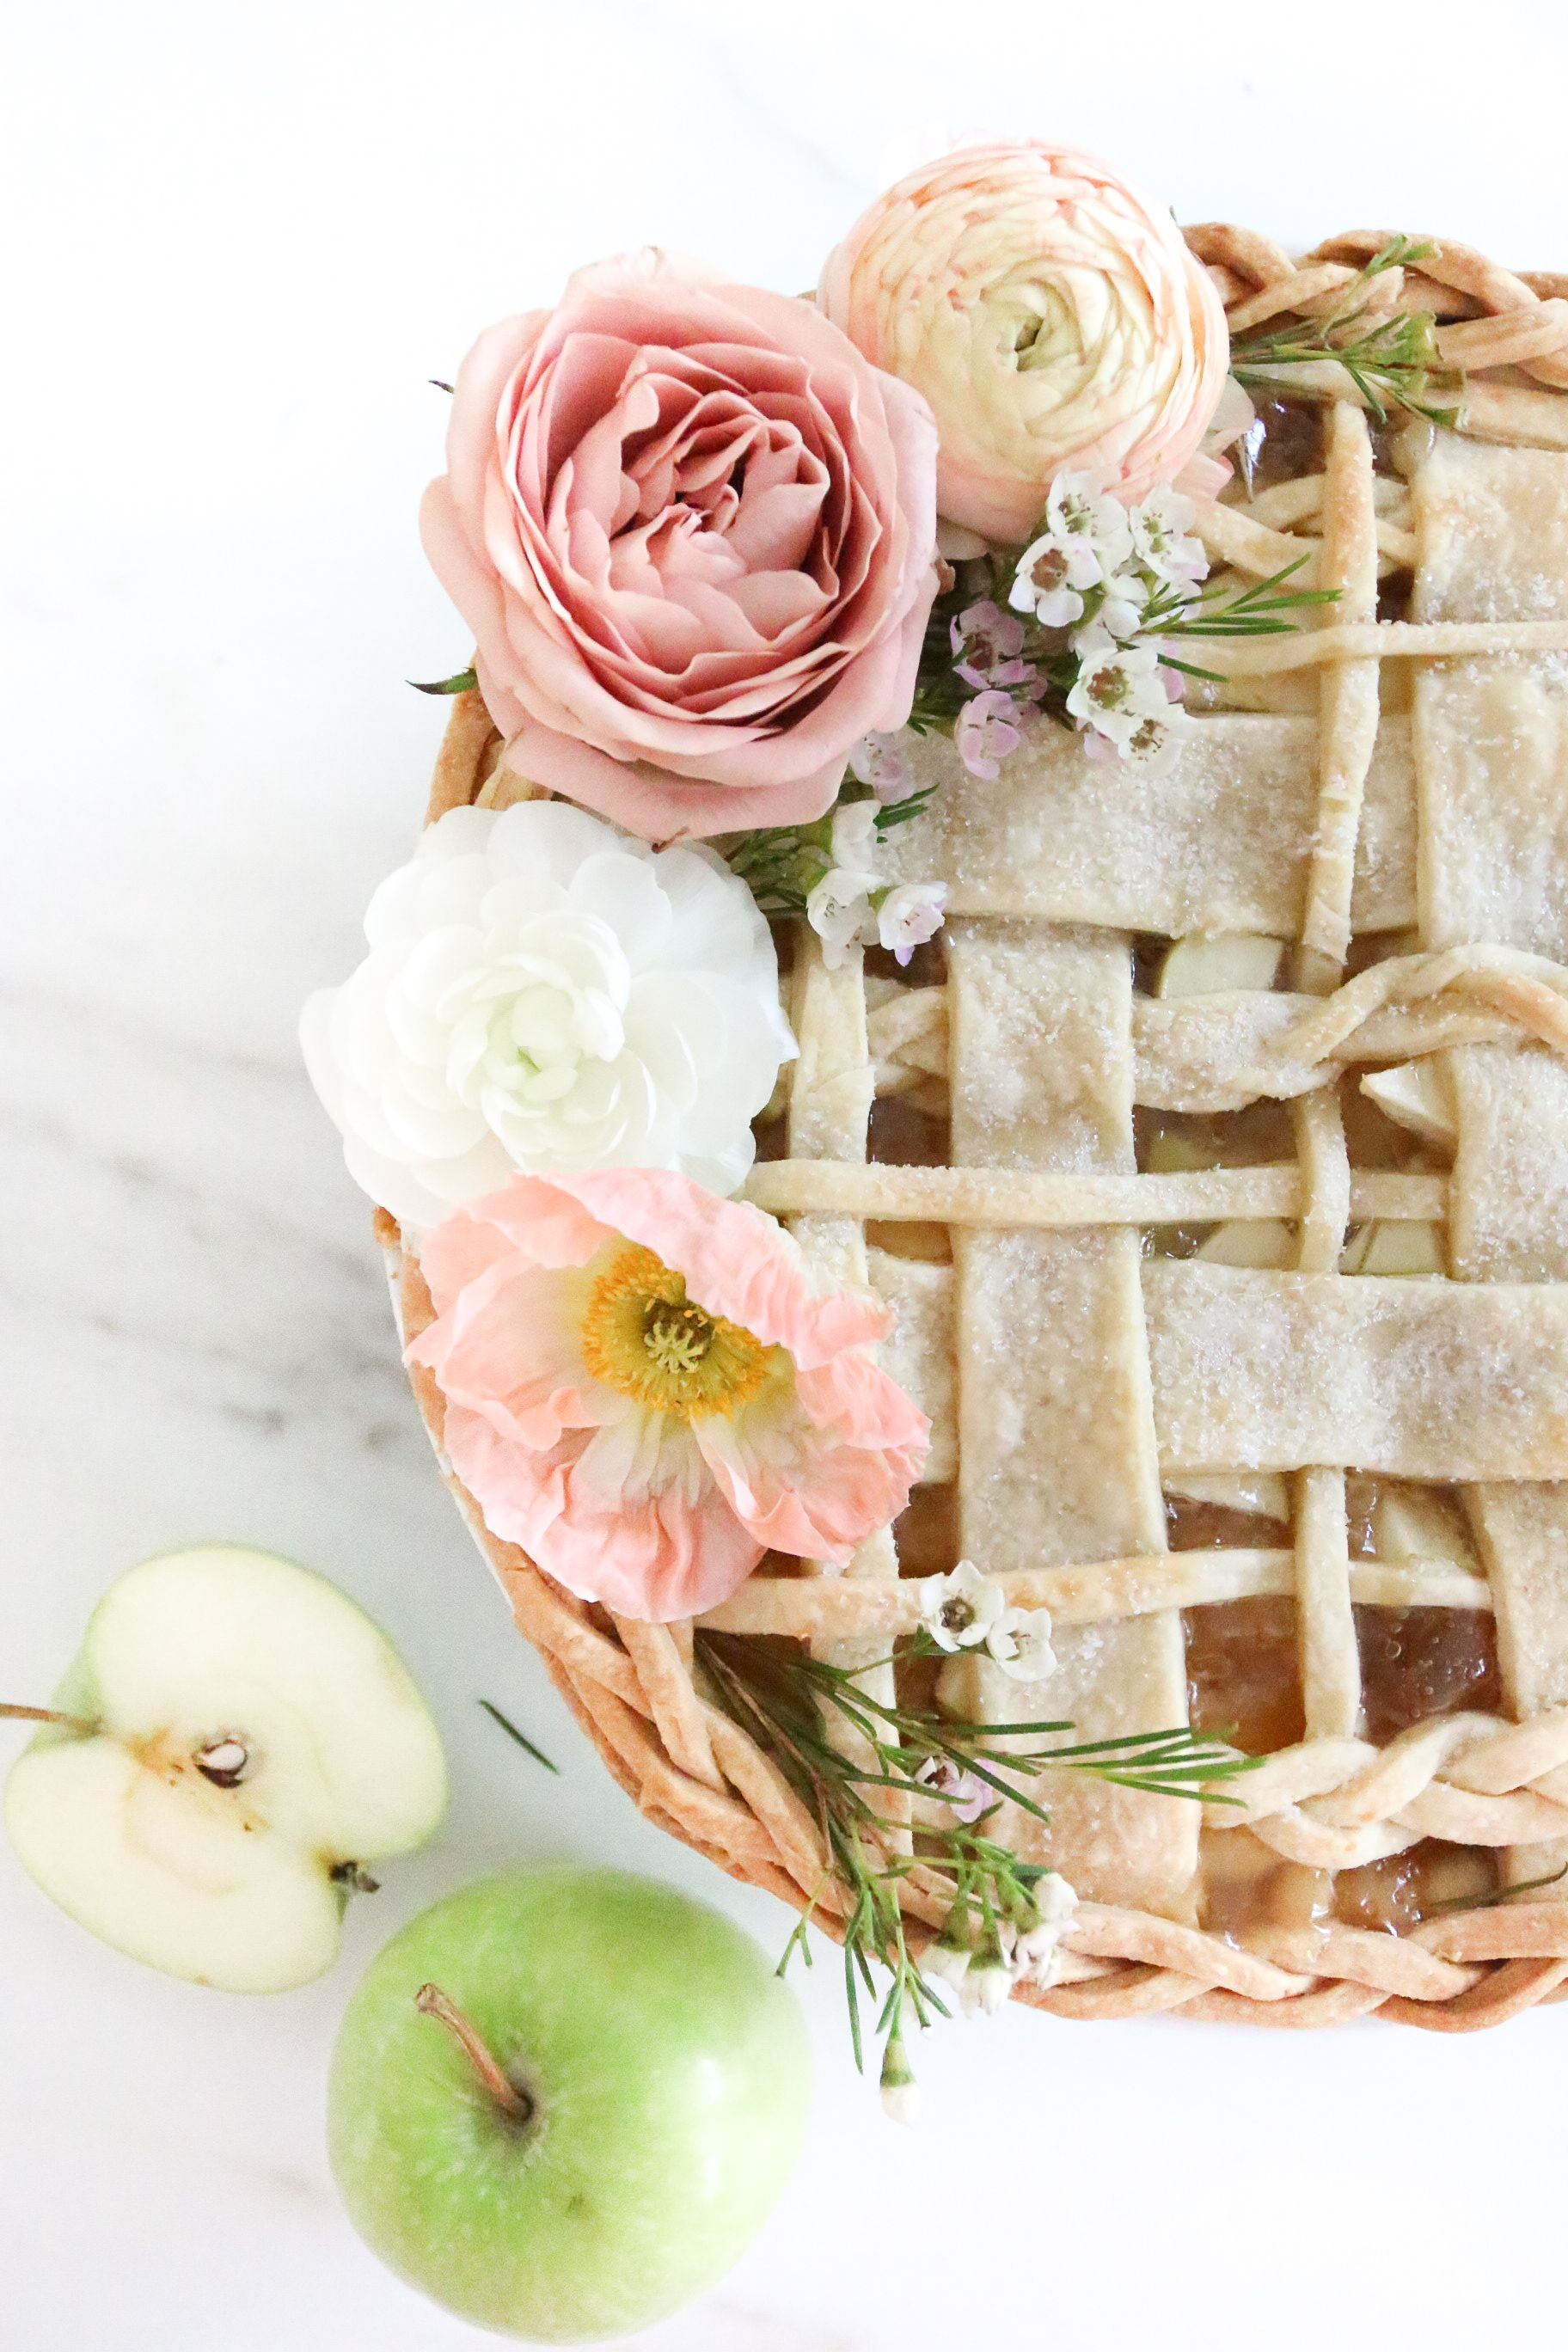 The prettiest apple pie Food CAKE & PIE Pinterest